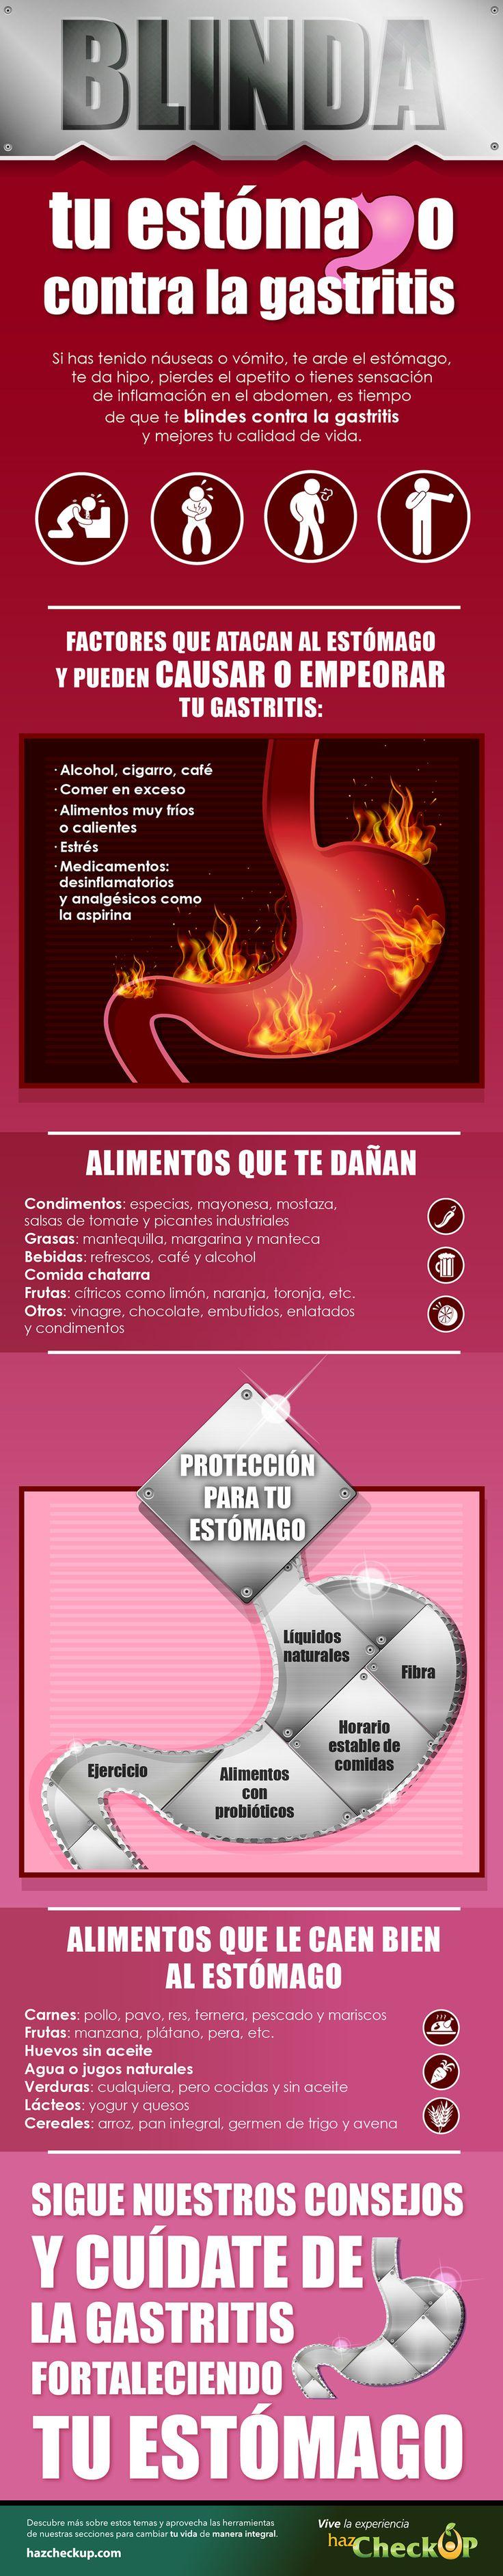 Alimentos que provocan gastritis | Tratamiento #gastritis #infography #estómago #stomach #salud #infografía #infografia #infographics